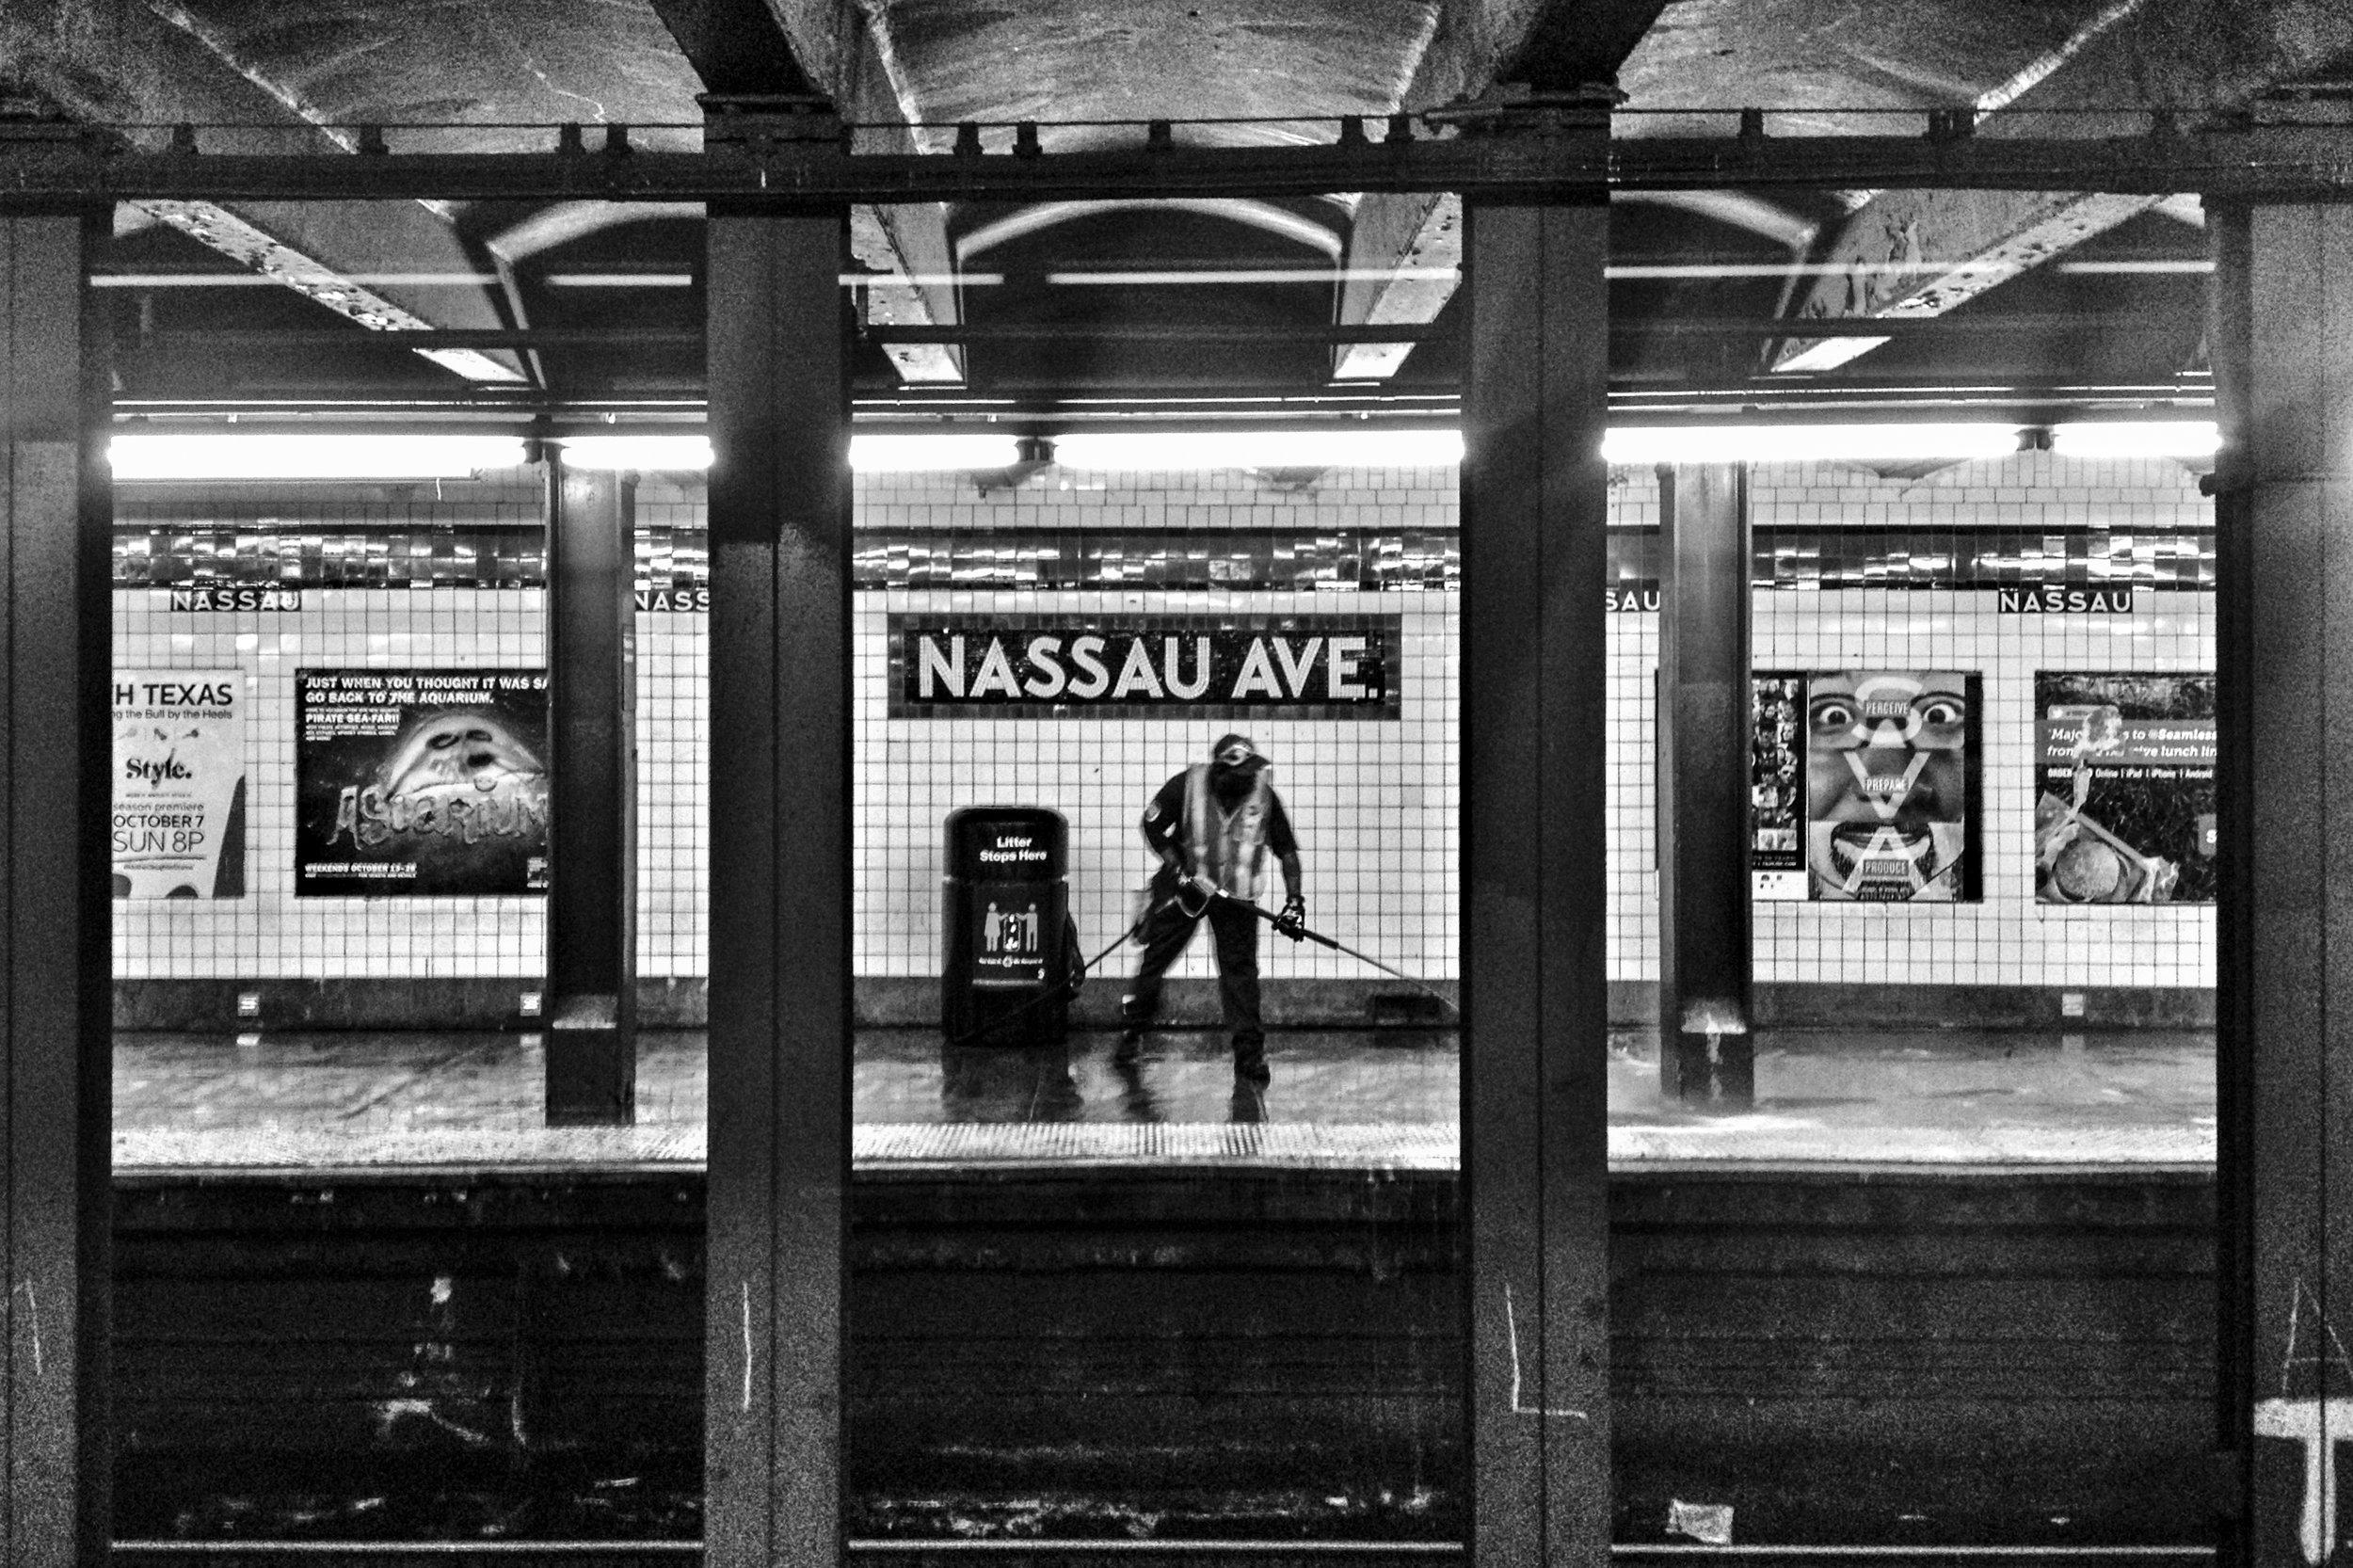 Snowstorm_Subway 05.jpg